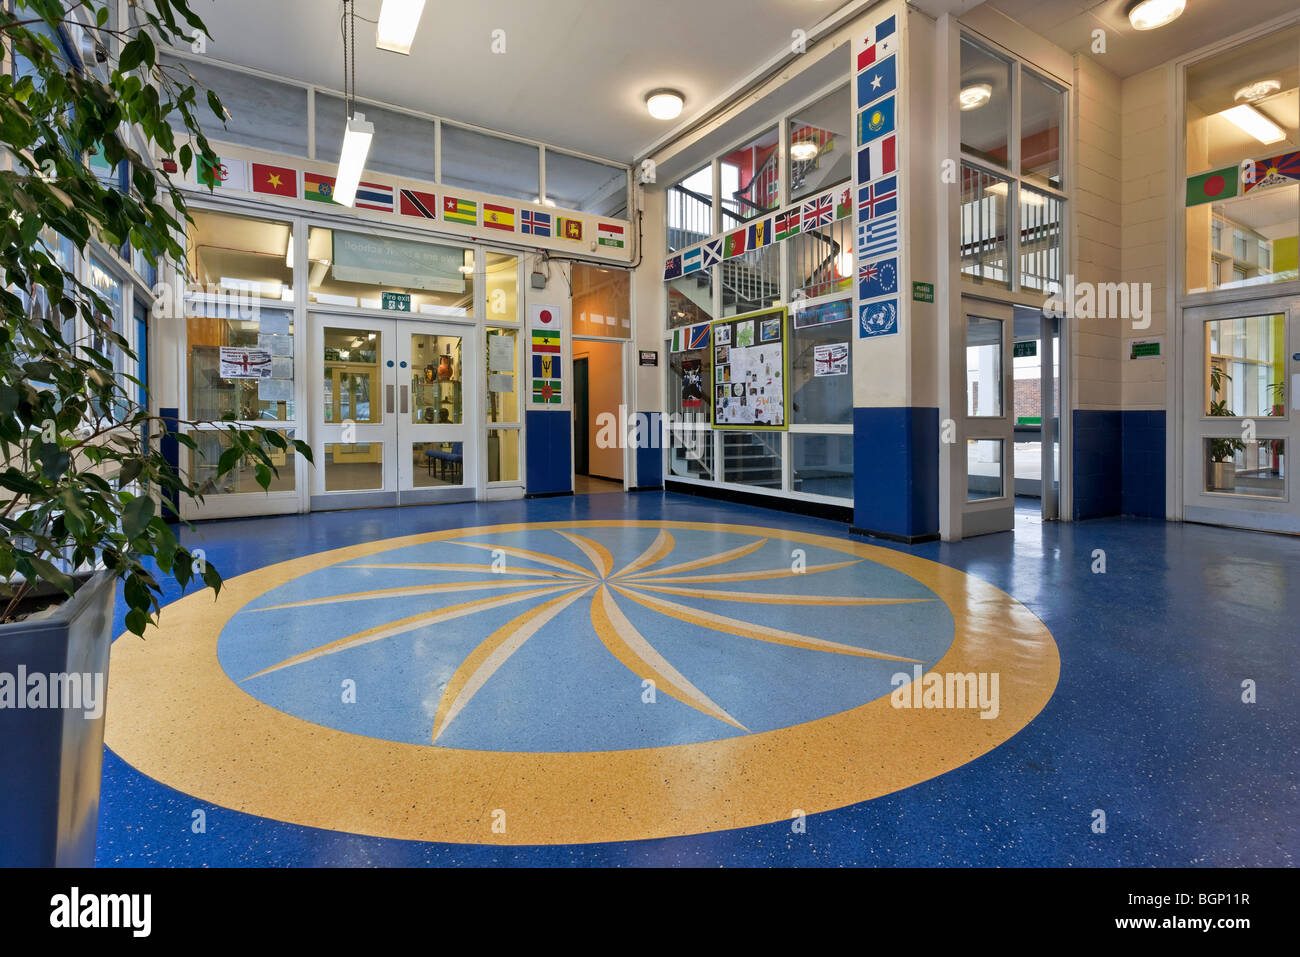 Floor detail at Stepney Green Tower School in London - Stock Image